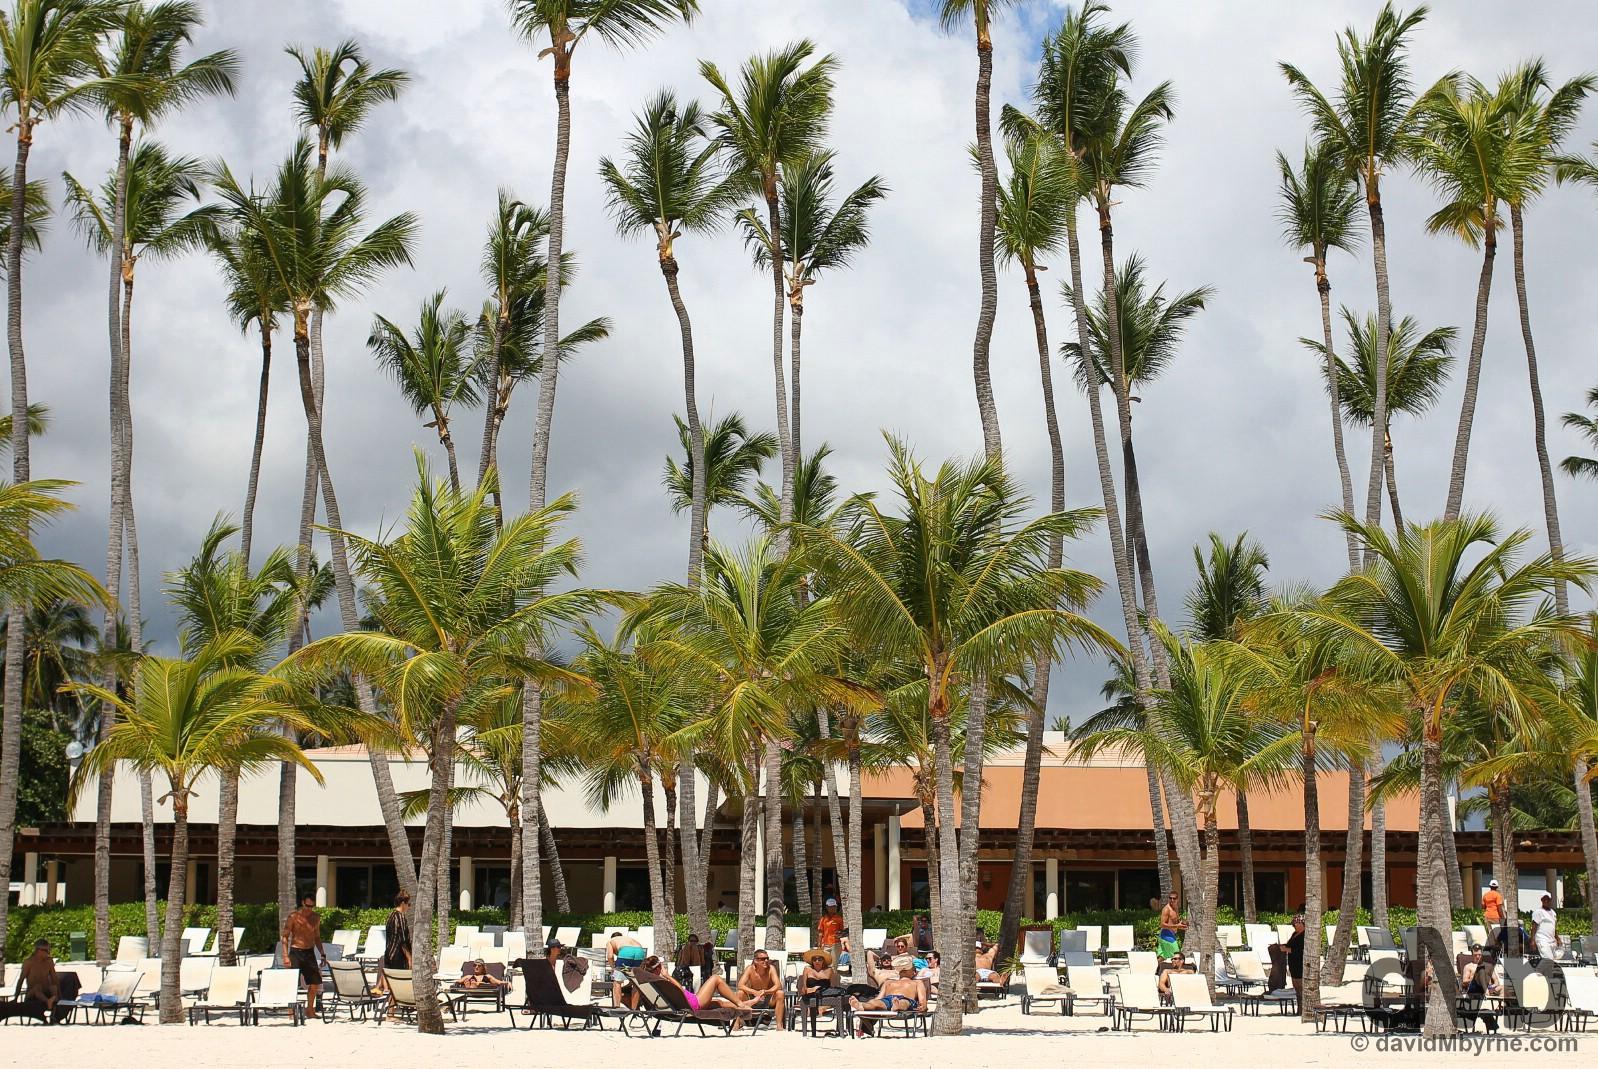 Bavaro Beach, Punta Cana, Dominican Republic. May 28, 2015.